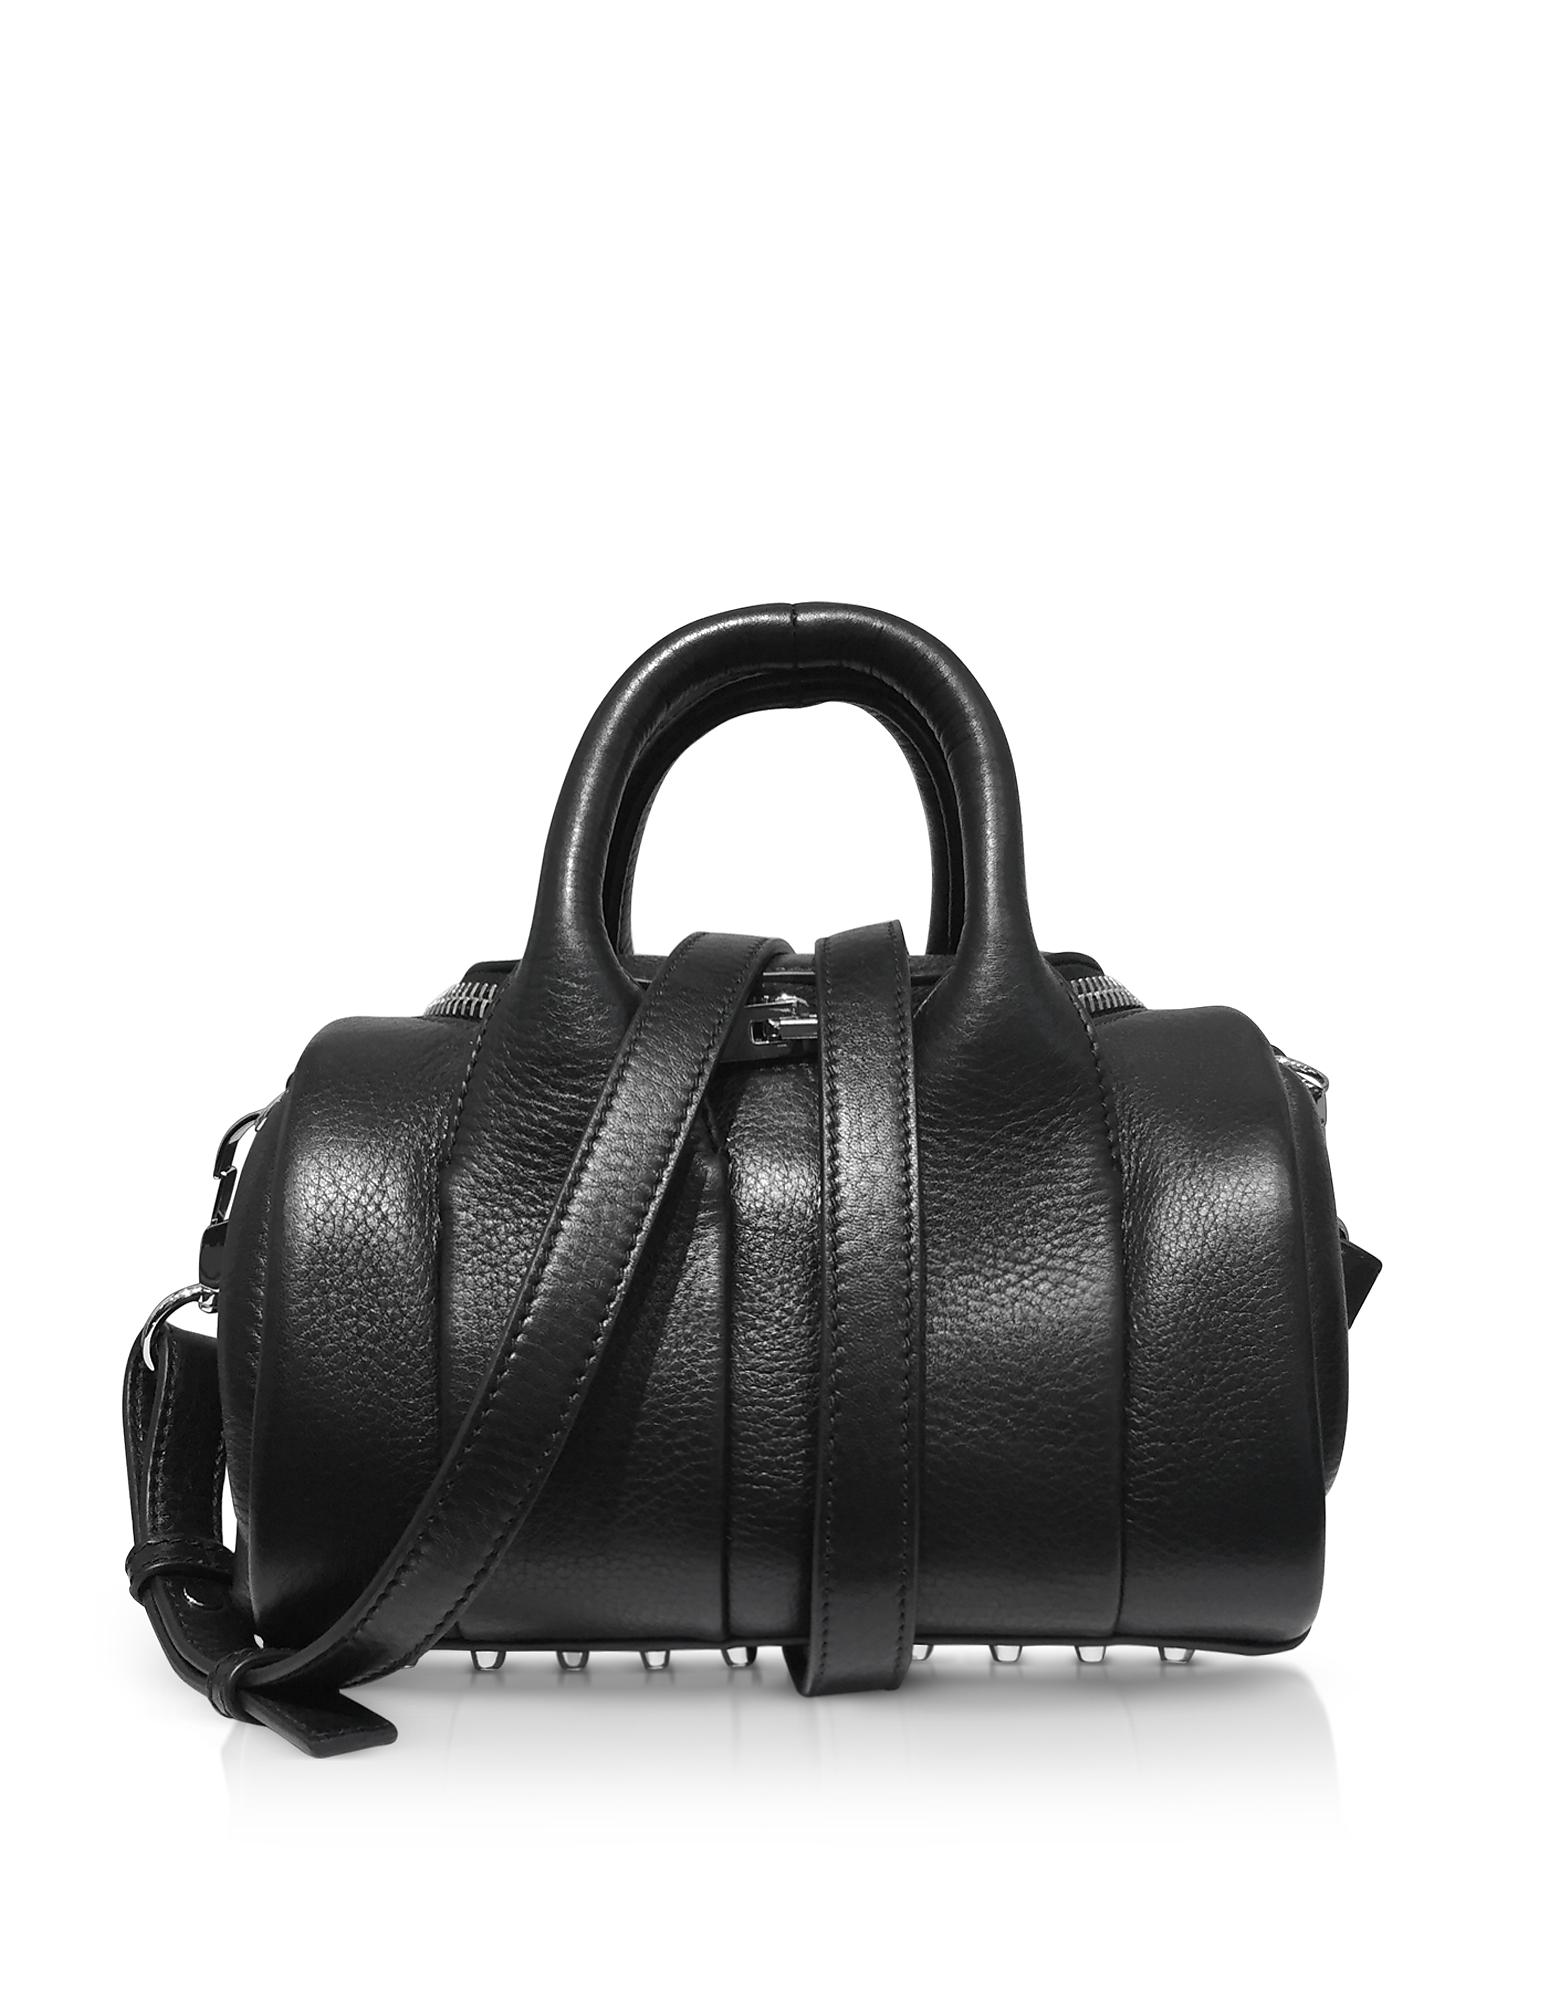 Alexander Wang Handbags, Mini Rockie Black Pebbled Leather Satchel Bag